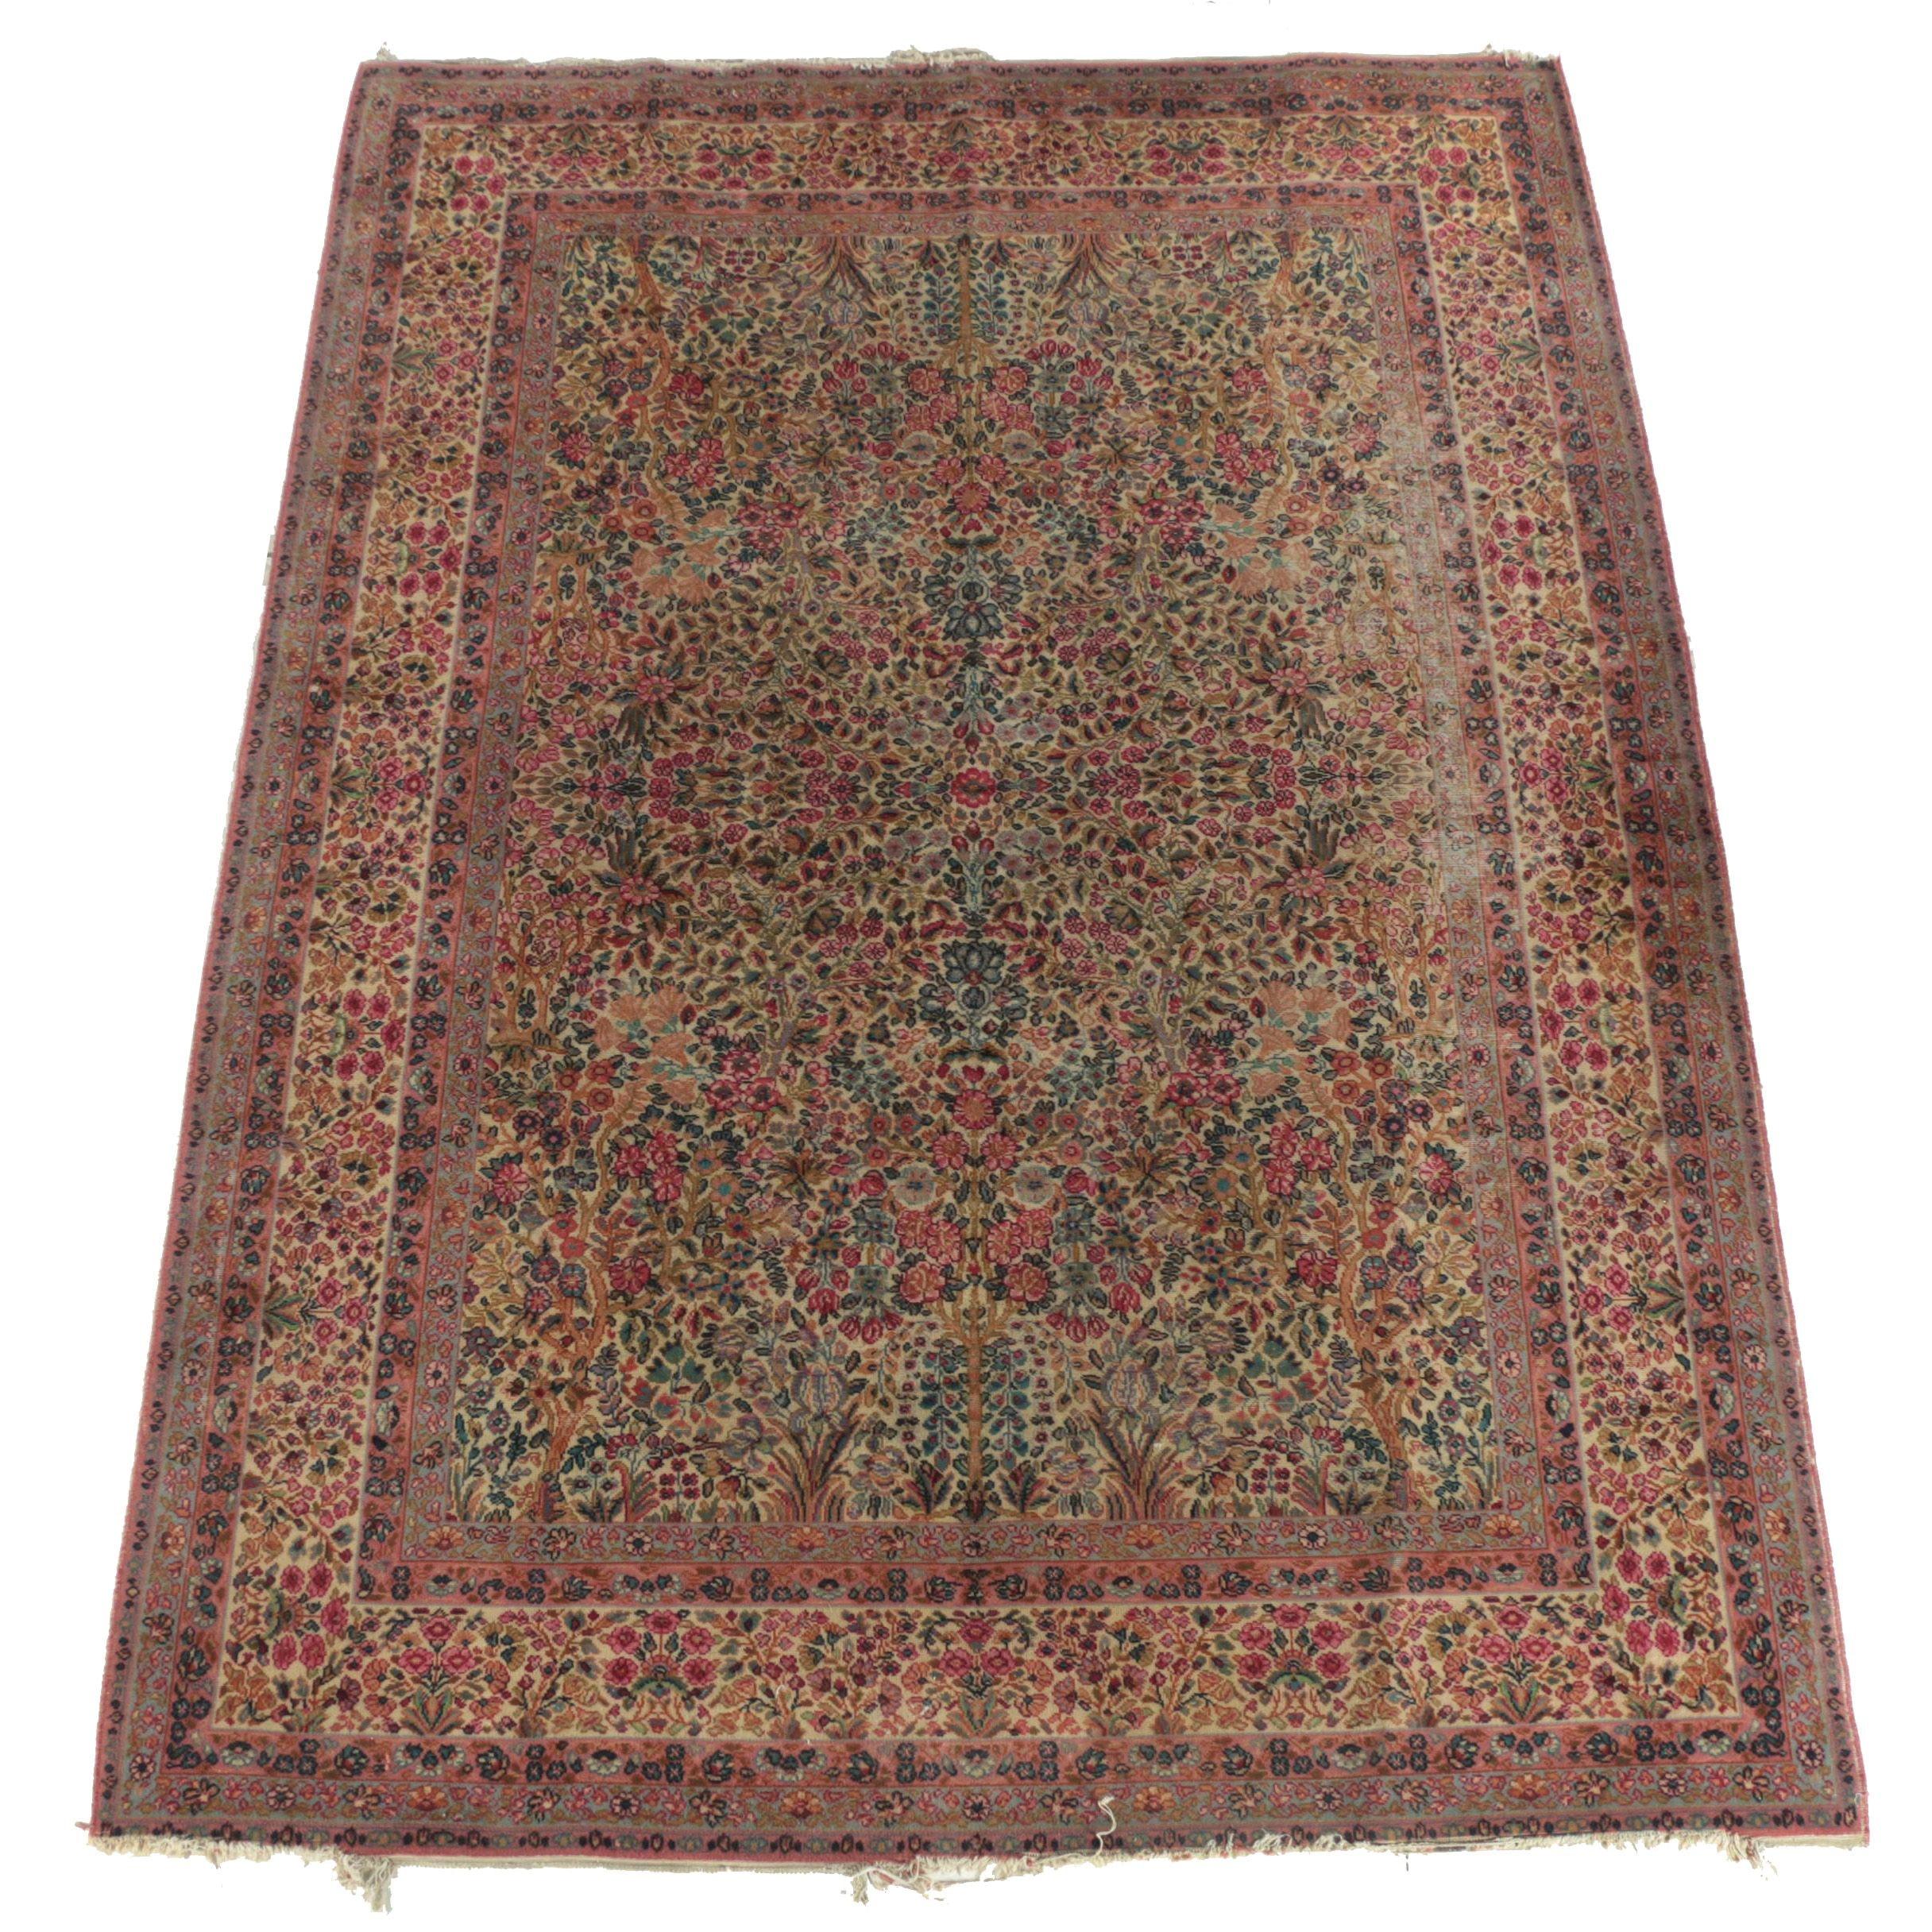 "Power Loomed Karastan ""Lanamar"" Persian Style Wool Room Sized Rug"